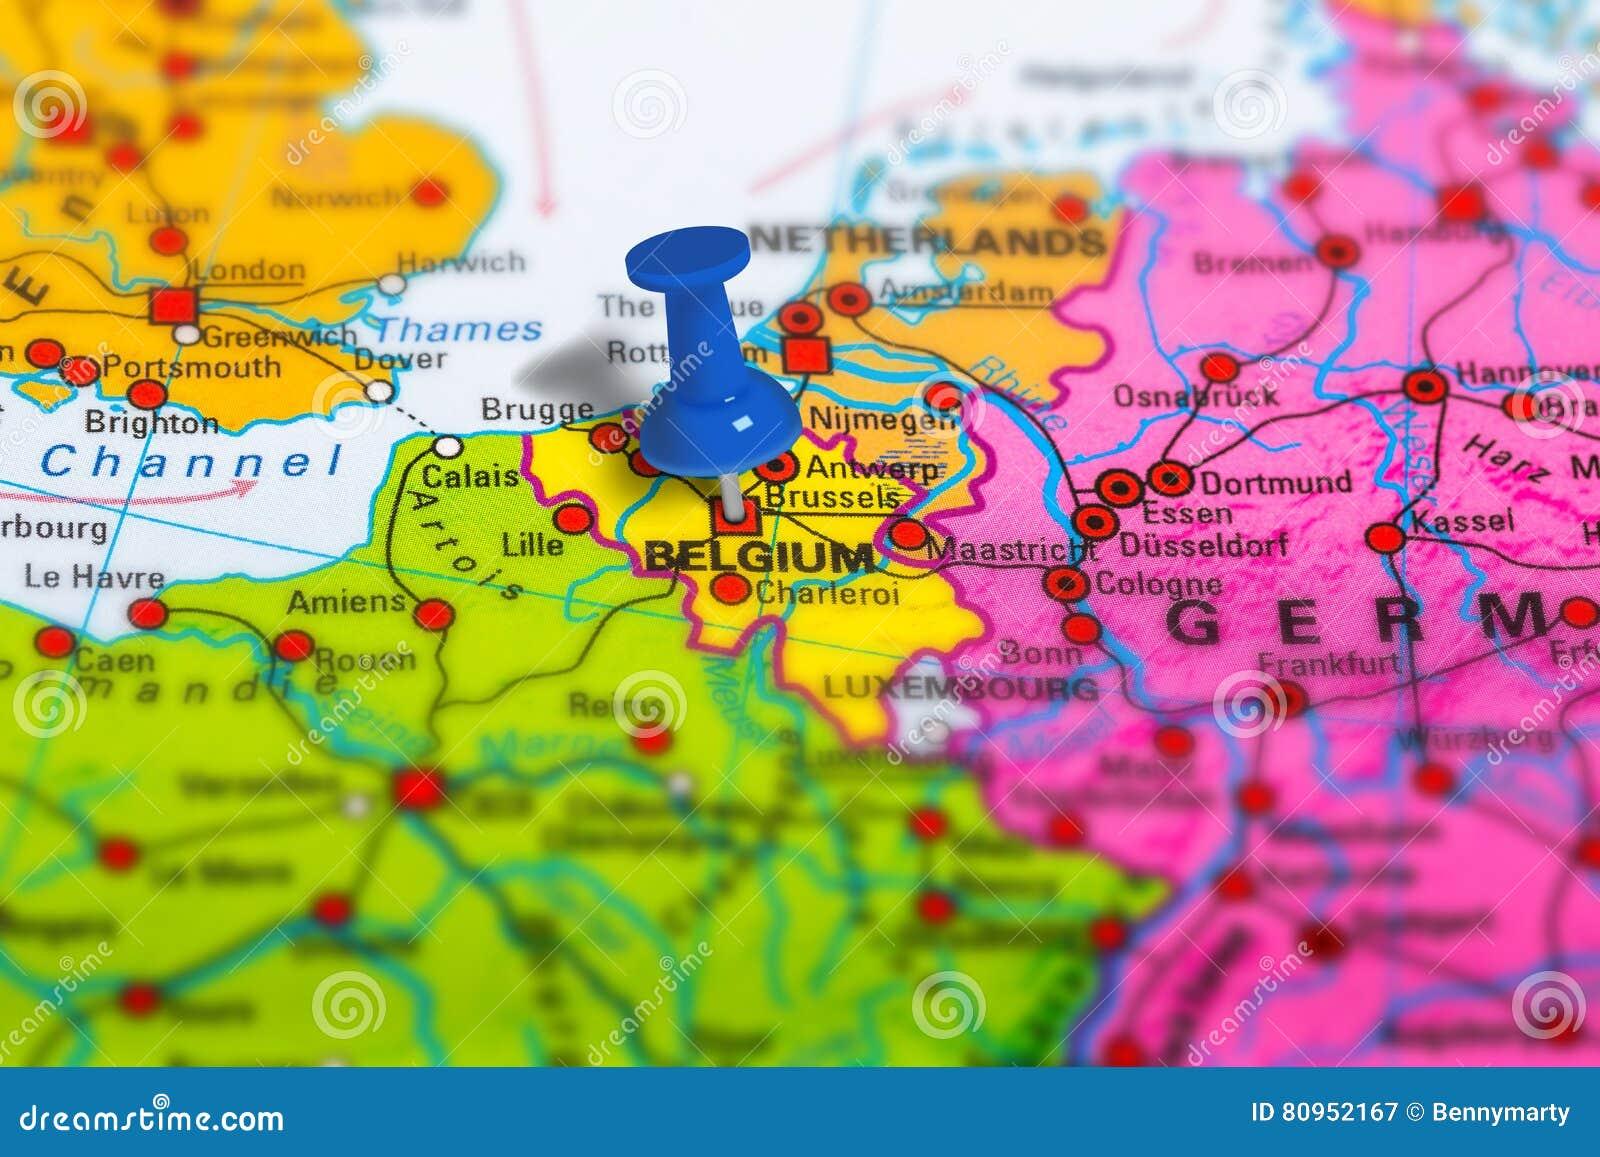 Mapa De Bruselas Belgica Imagen De Archivo Imagen De Pais 80952167